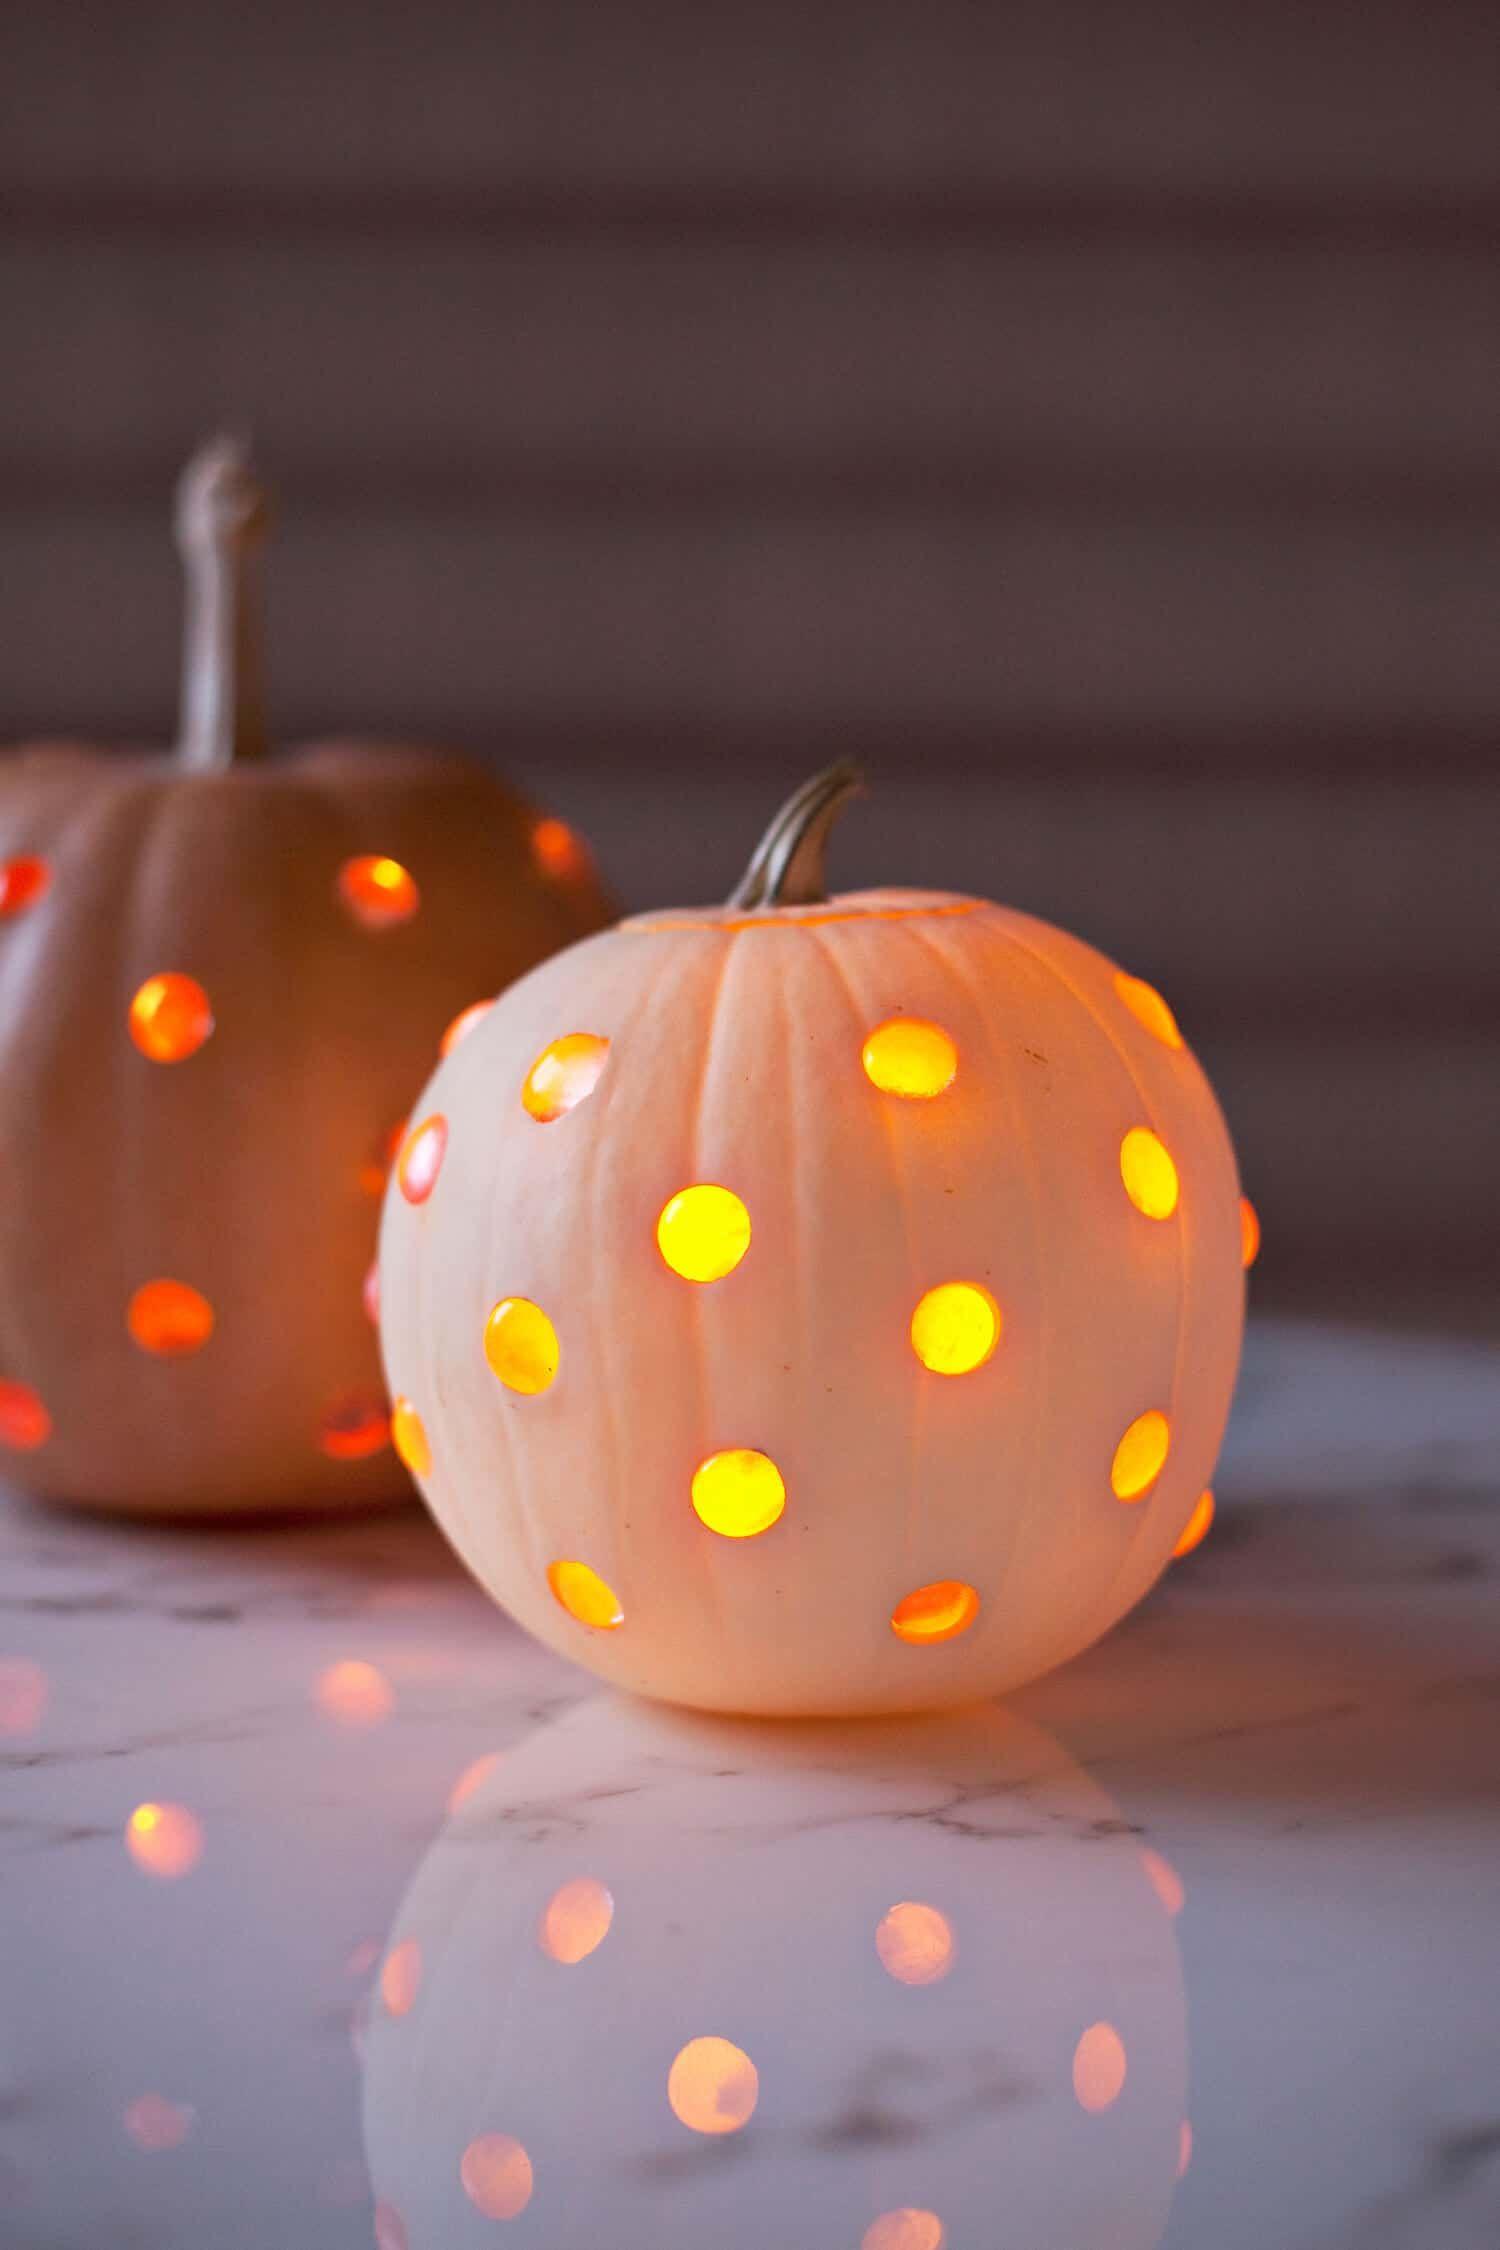 Pumpkin carving ideas creative jack o lantern designs